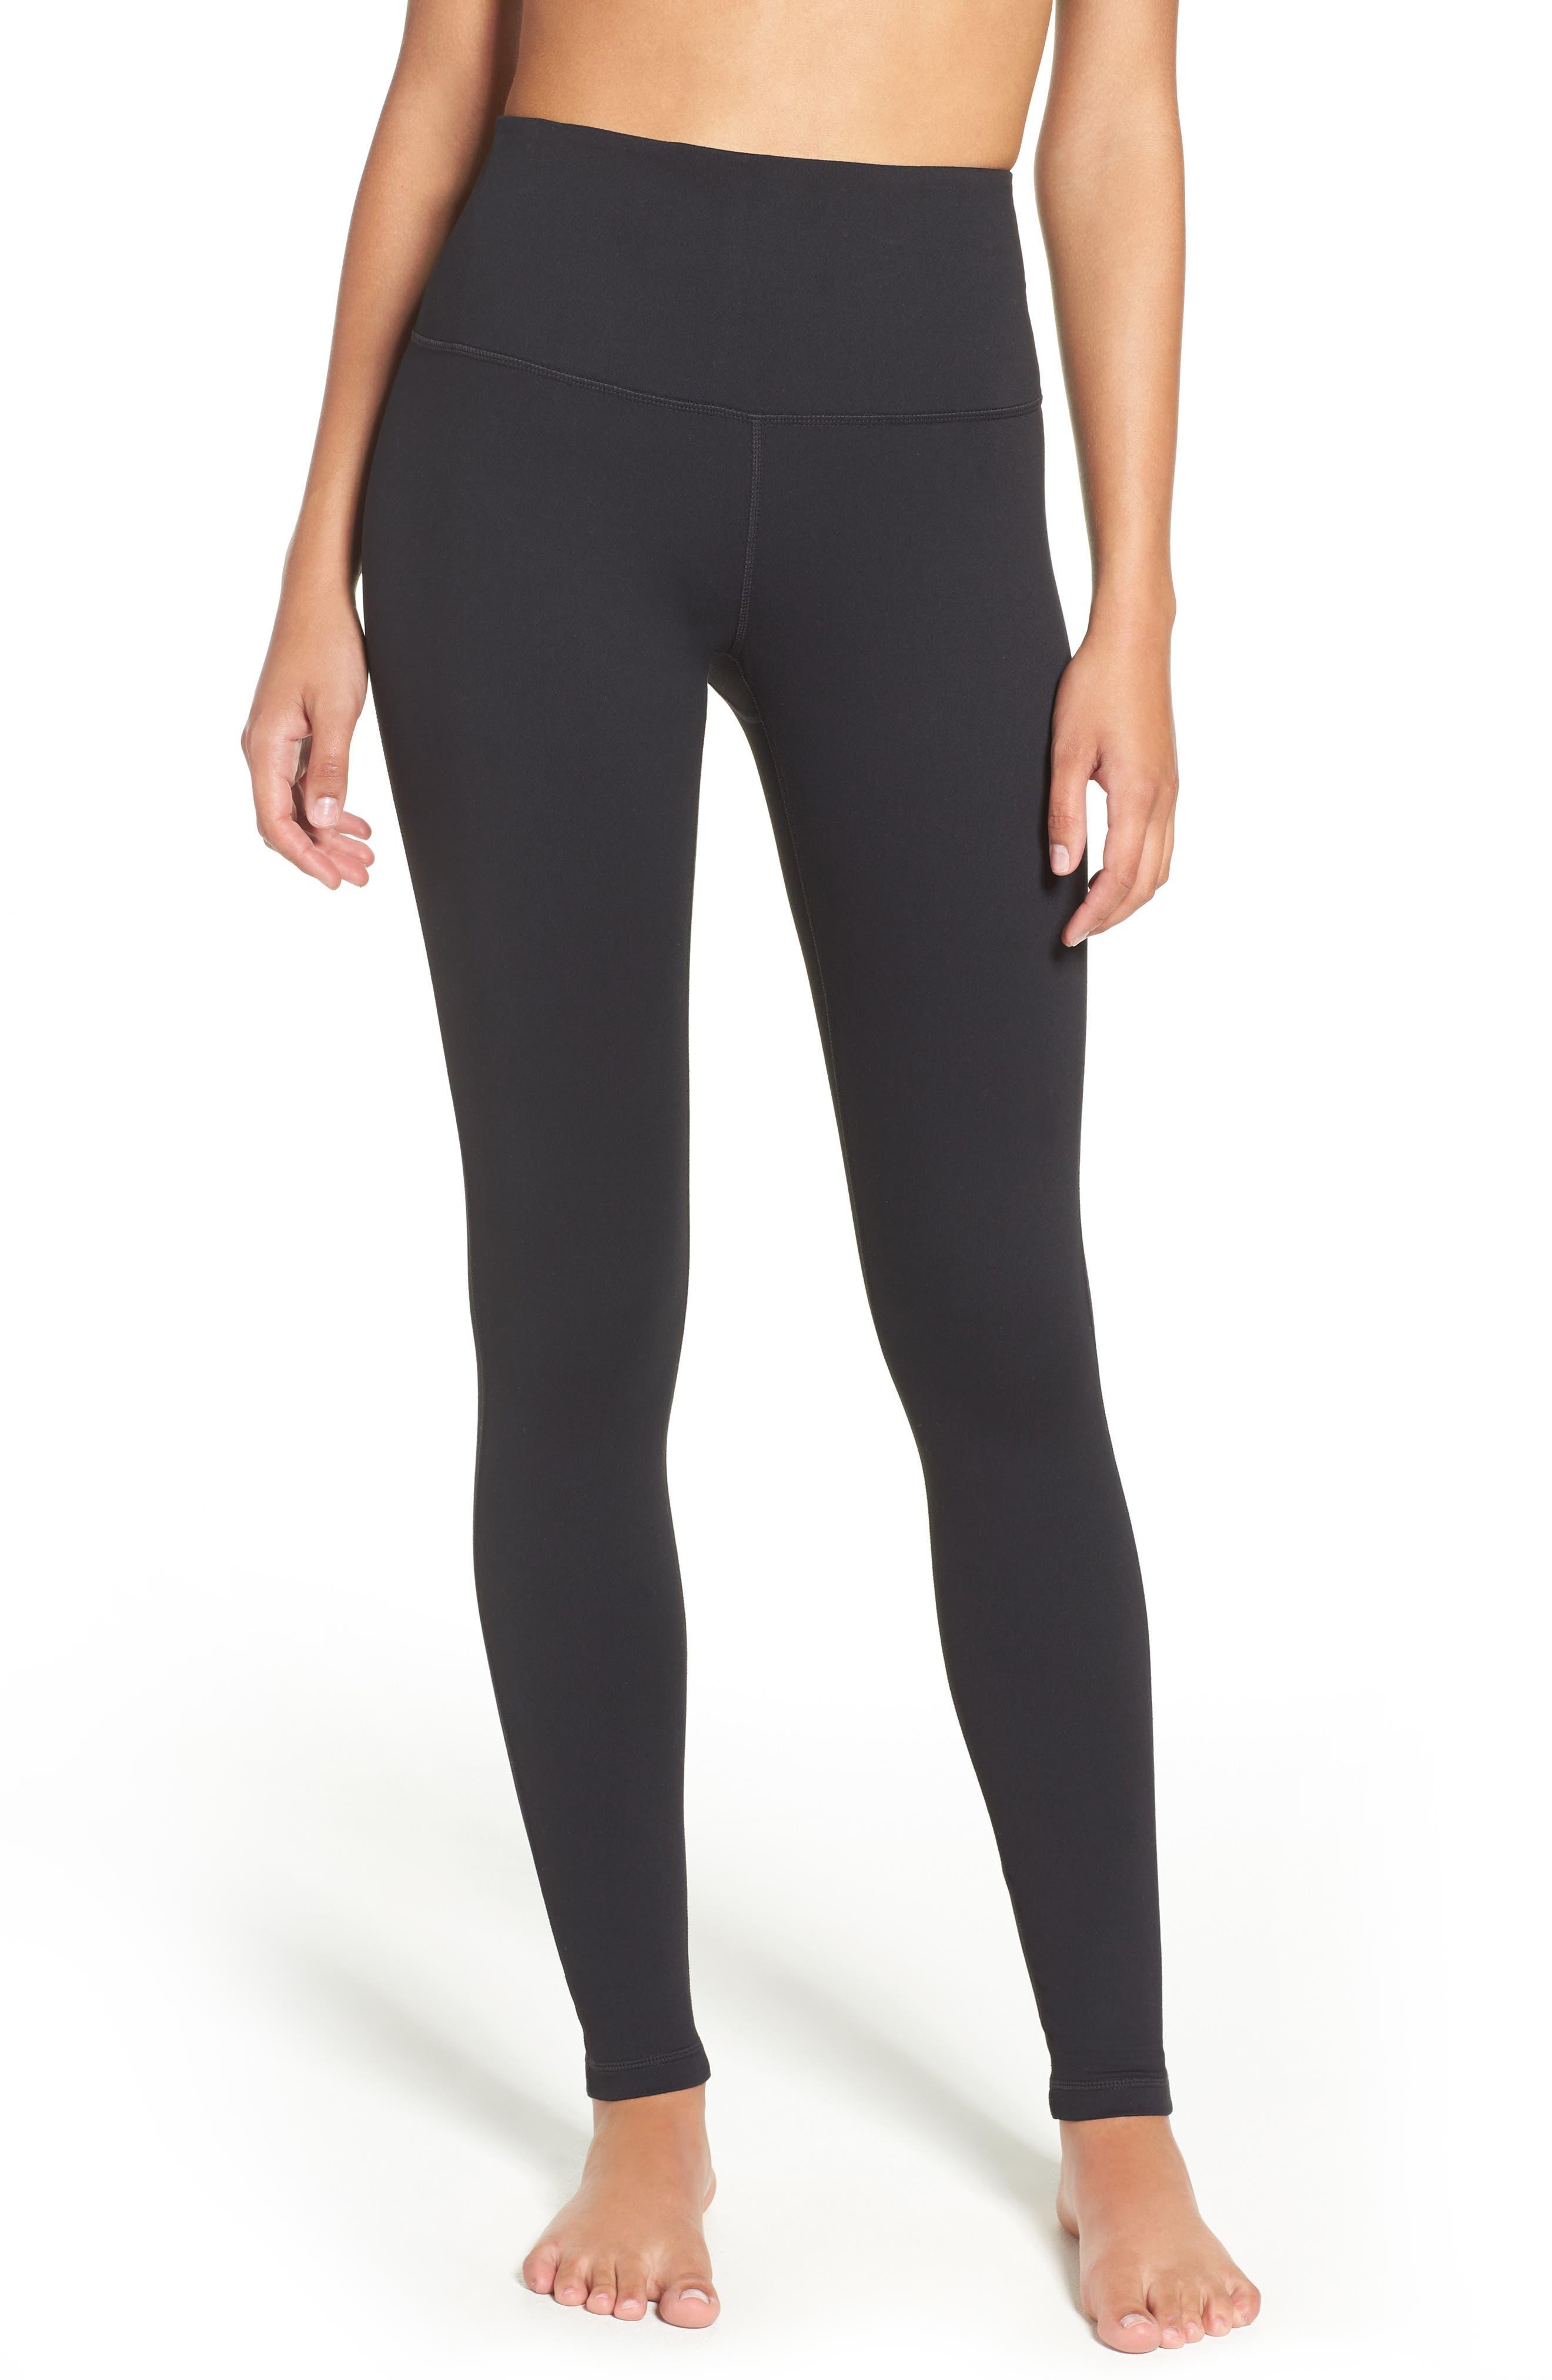 60s – 70s Pants, Jeans, Hippie, Bell Bottoms, Jumpsuits Womens Zella Live In High Waist Leggings $59.00 AT vintagedancer.com